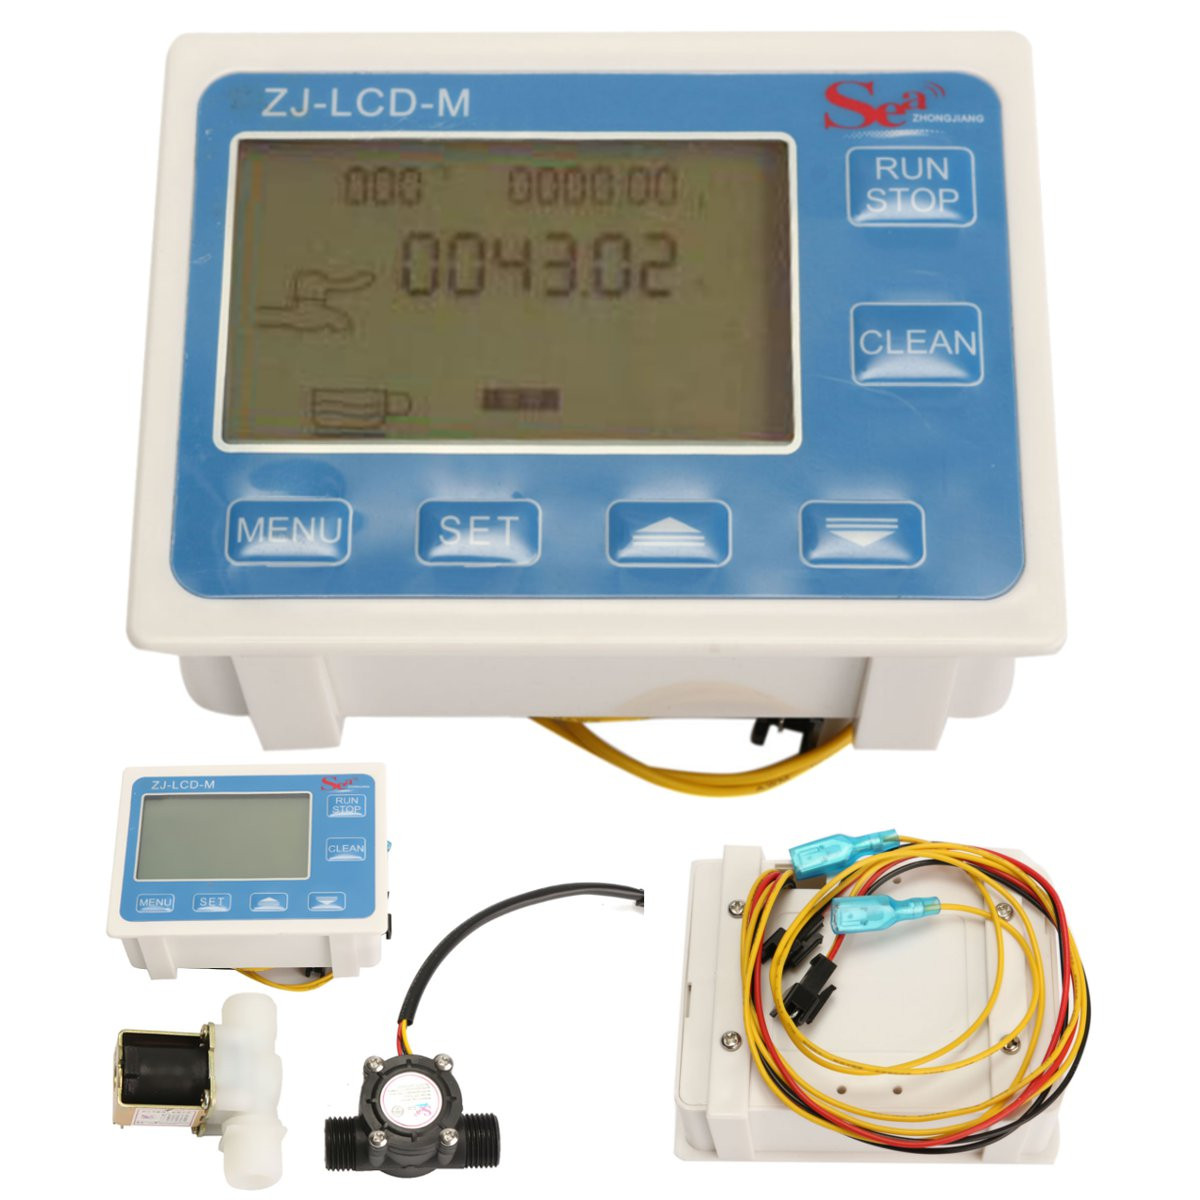 1Pcs Durable Quality 1/2 Water Flow Control Meter LCD Display + Flow Sensor + Solenoid Valve light weight